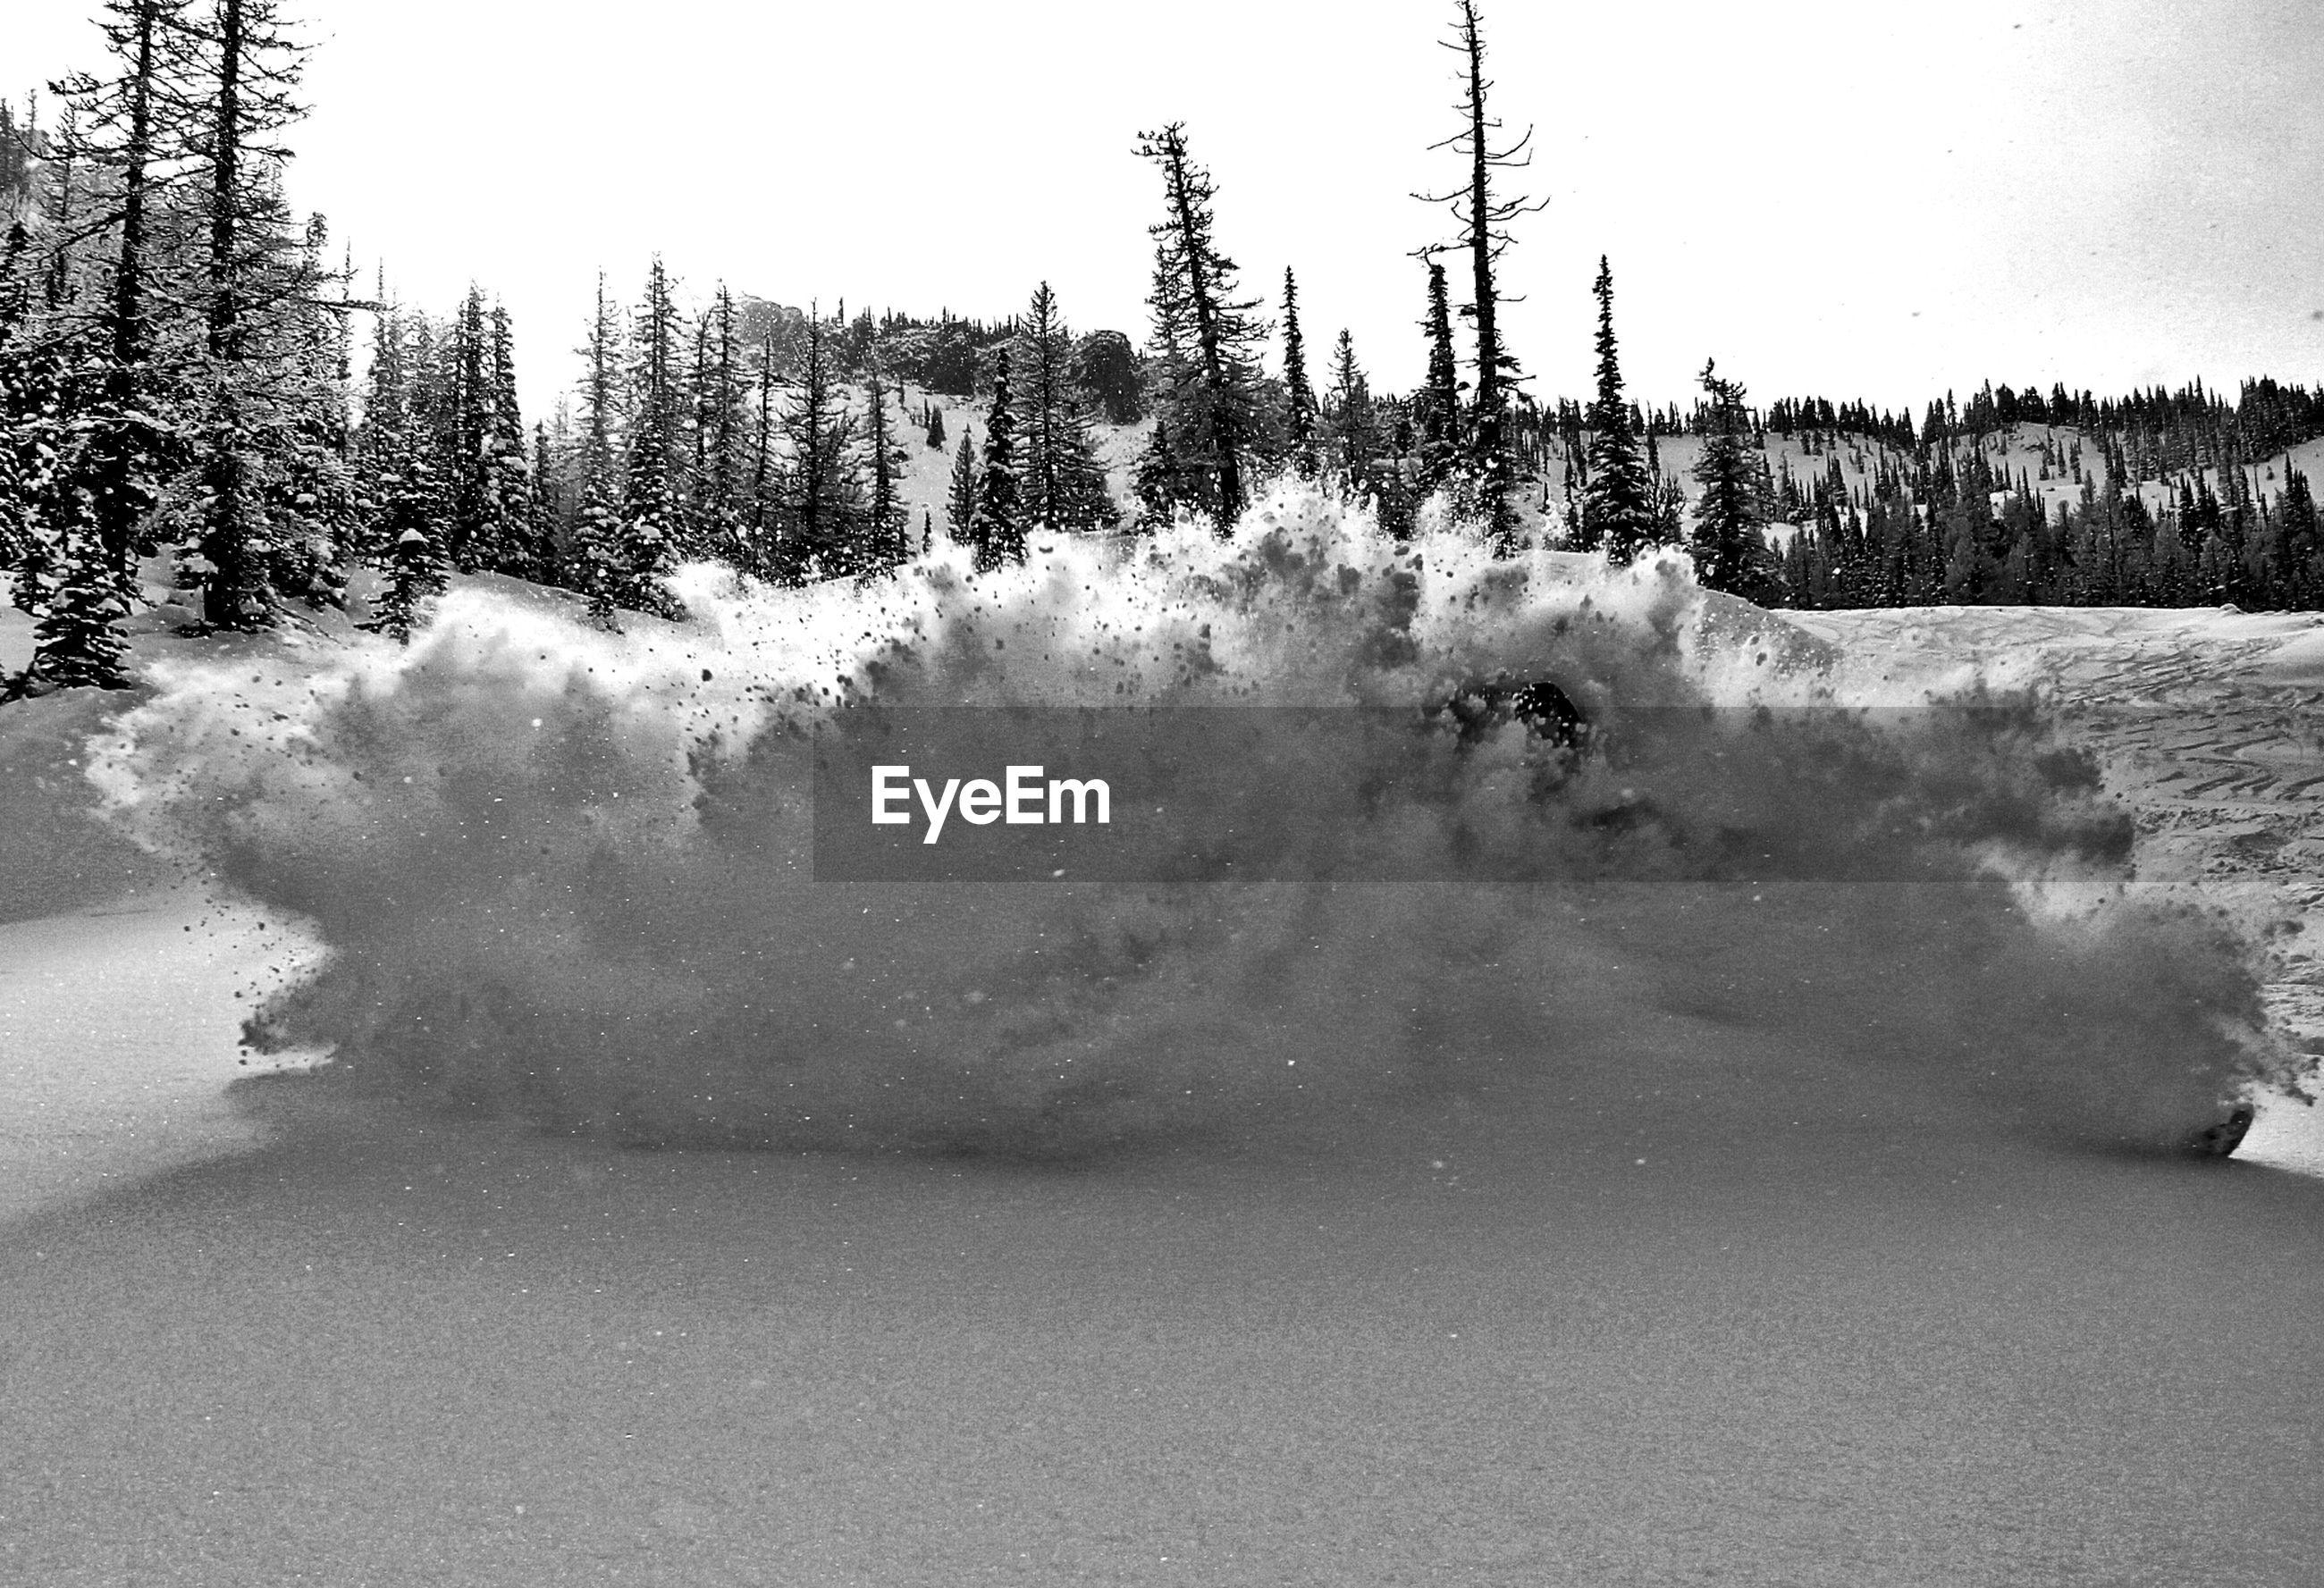 Snow exploding against pine trees